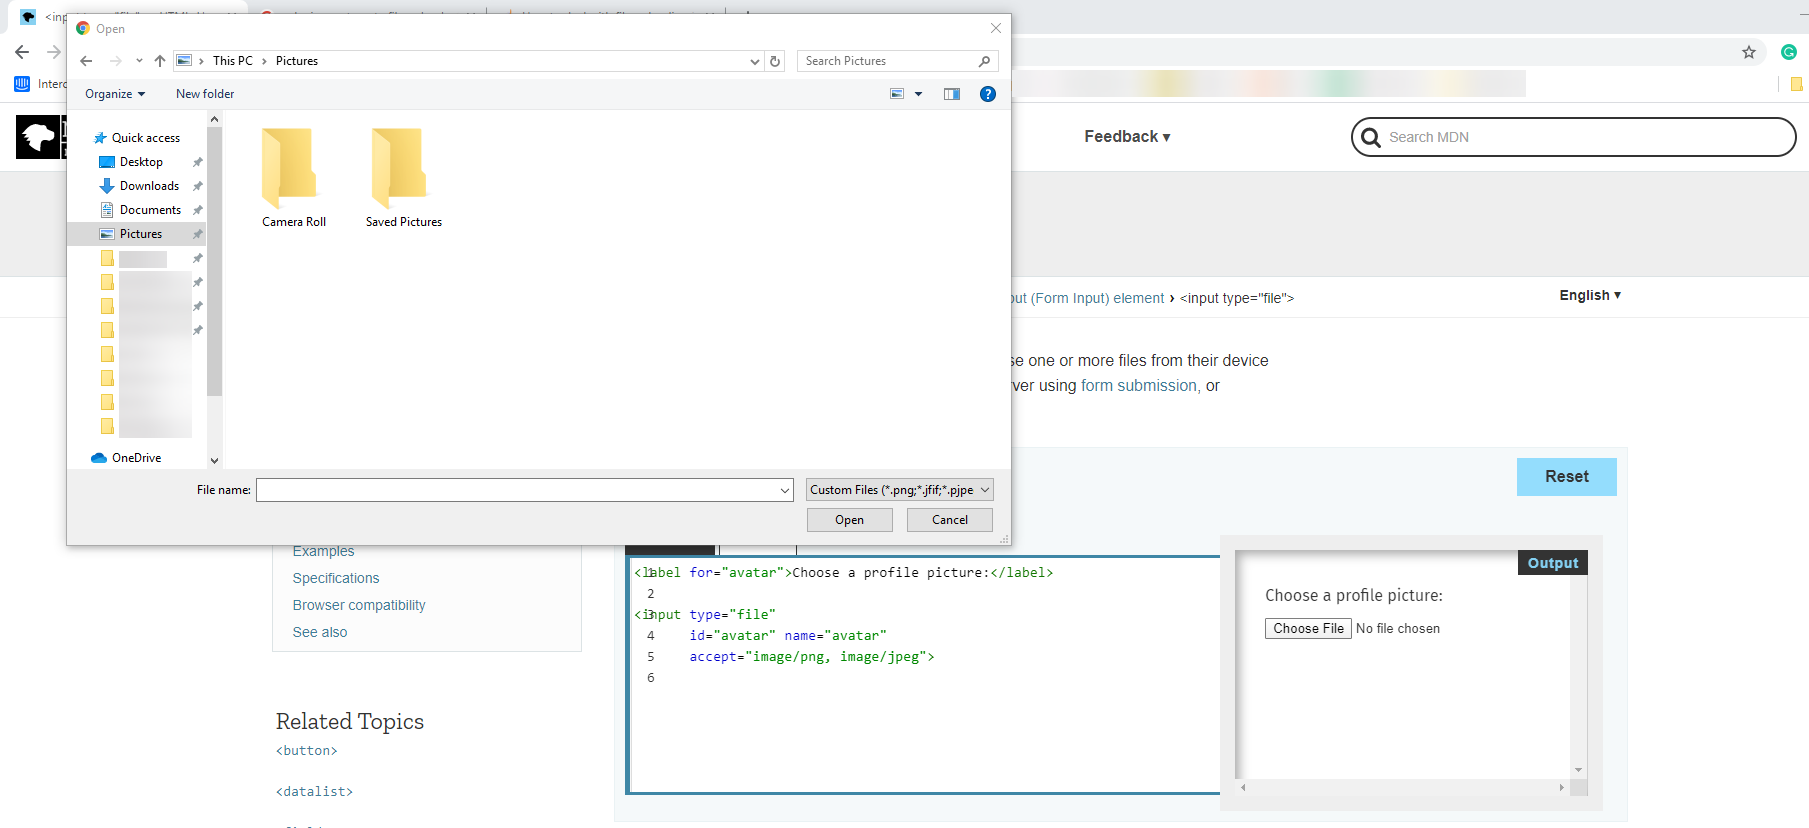 native OS file explorer dialog